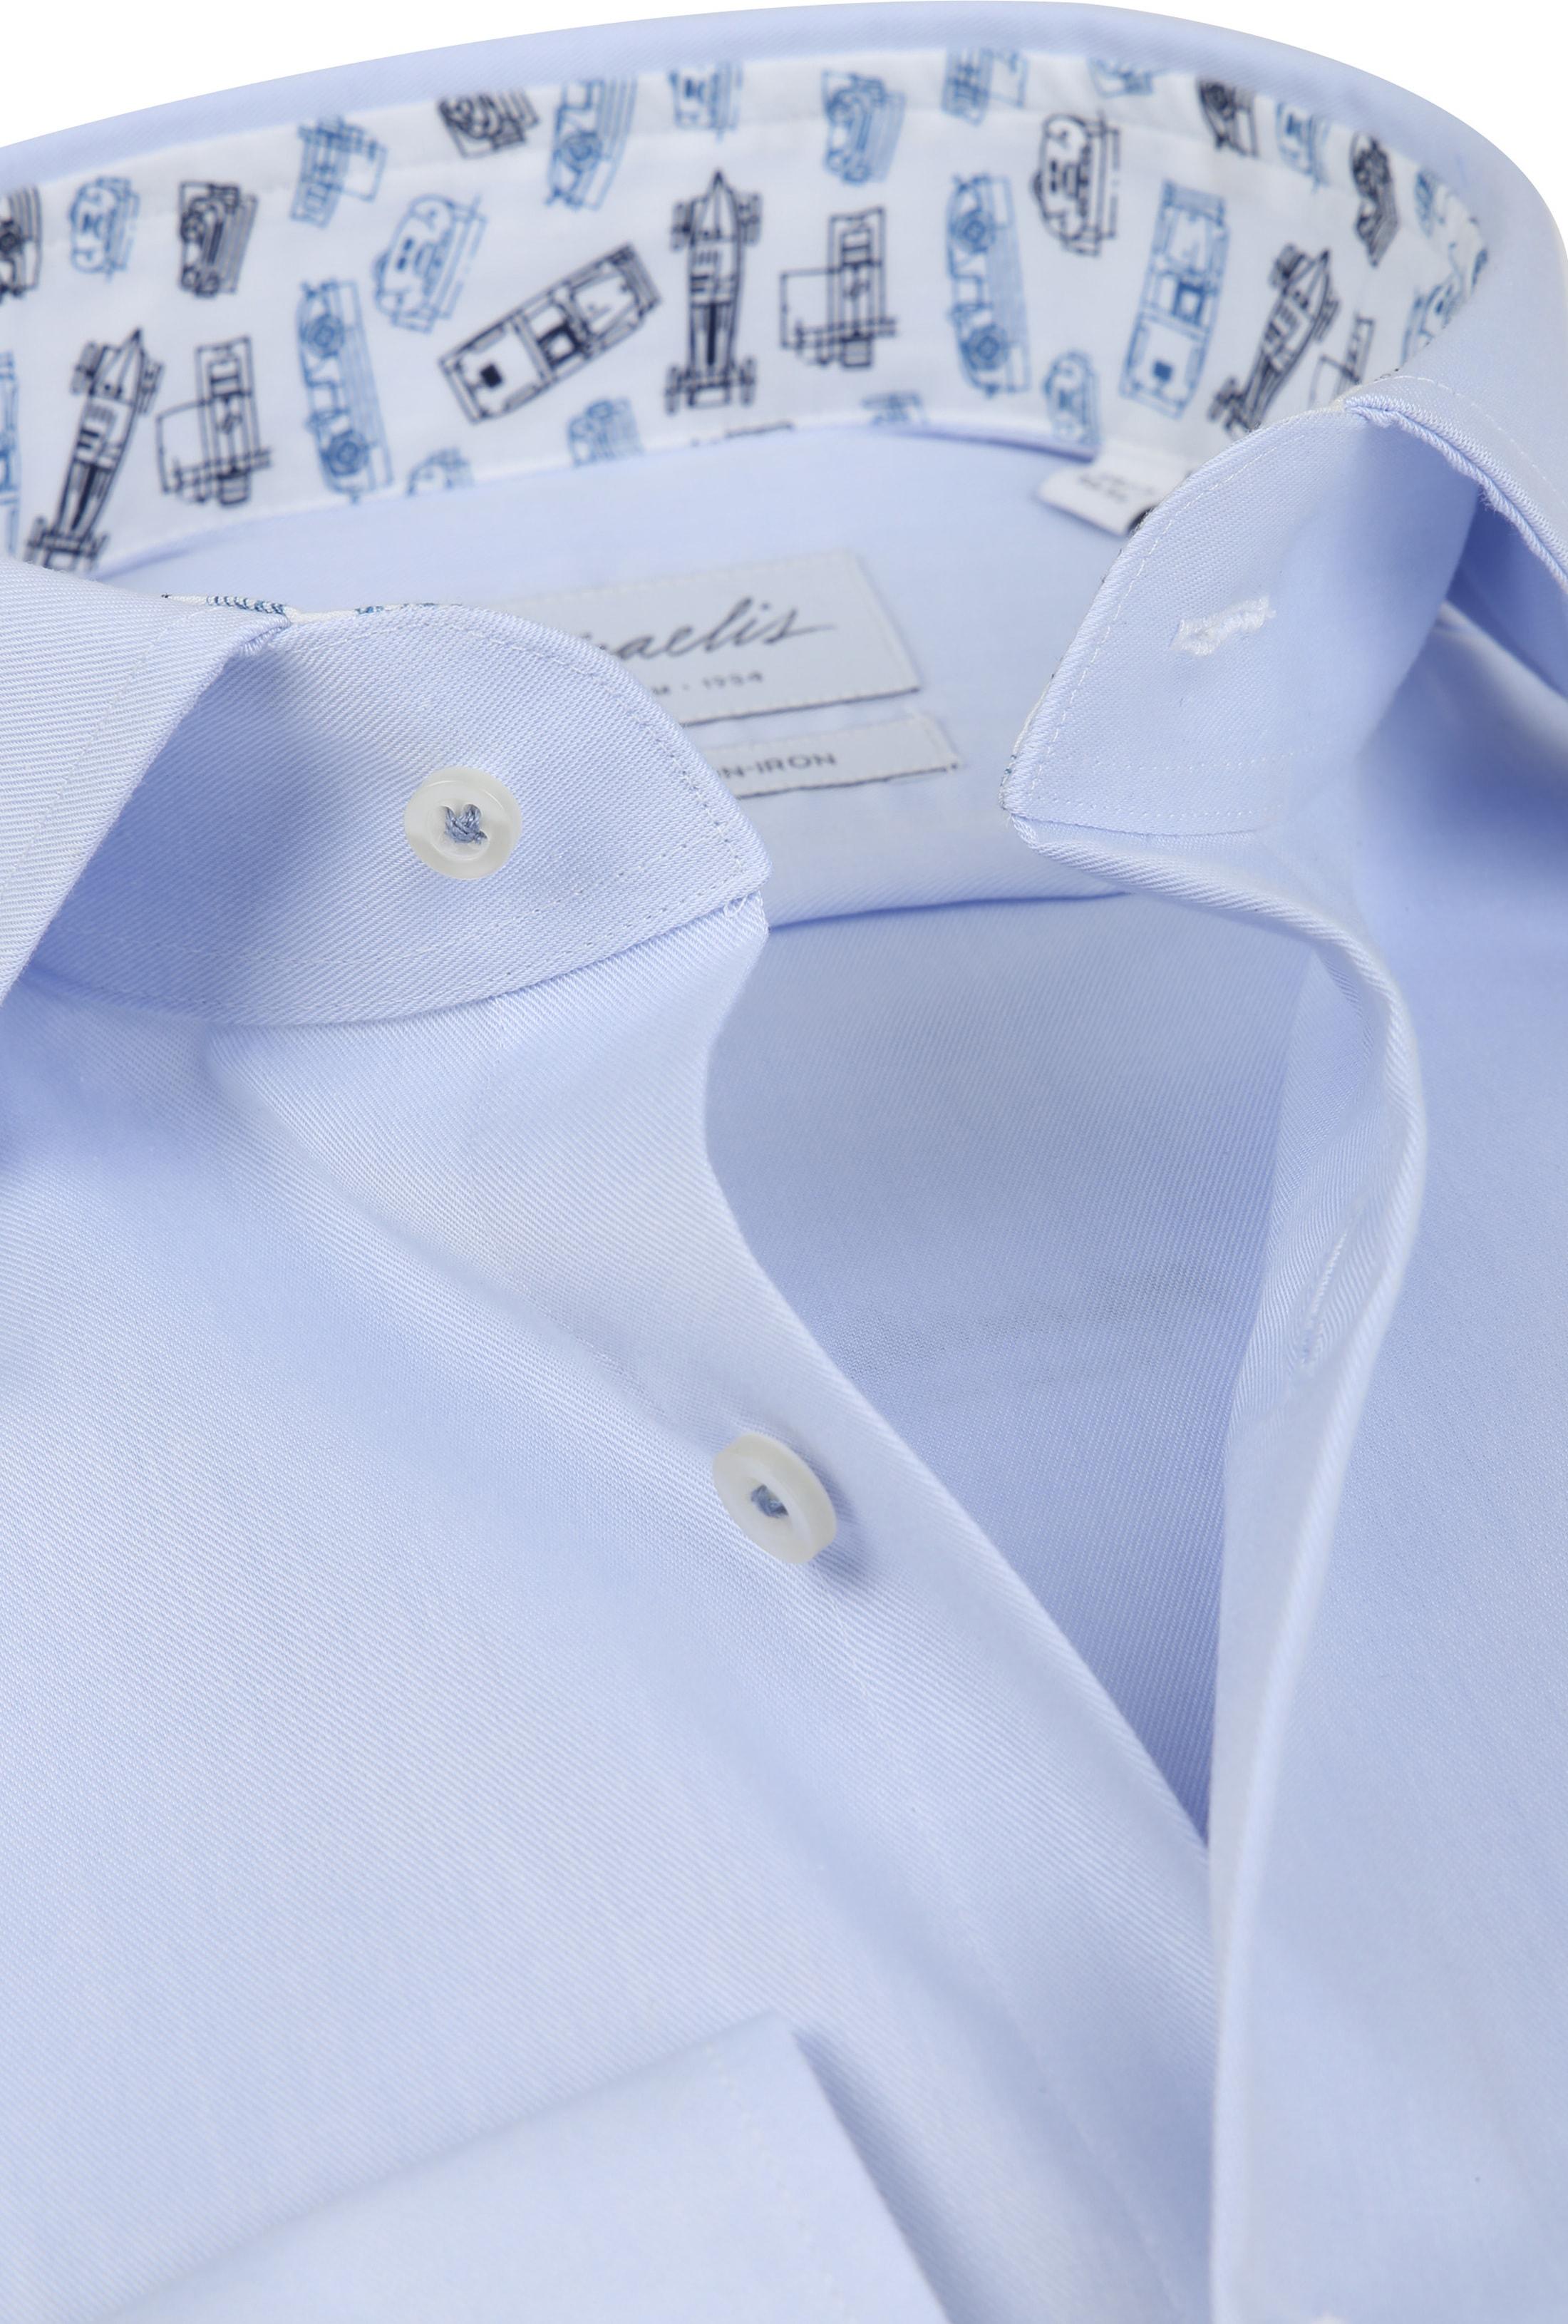 Michaelis Shirt SL7 Blue  foto 1